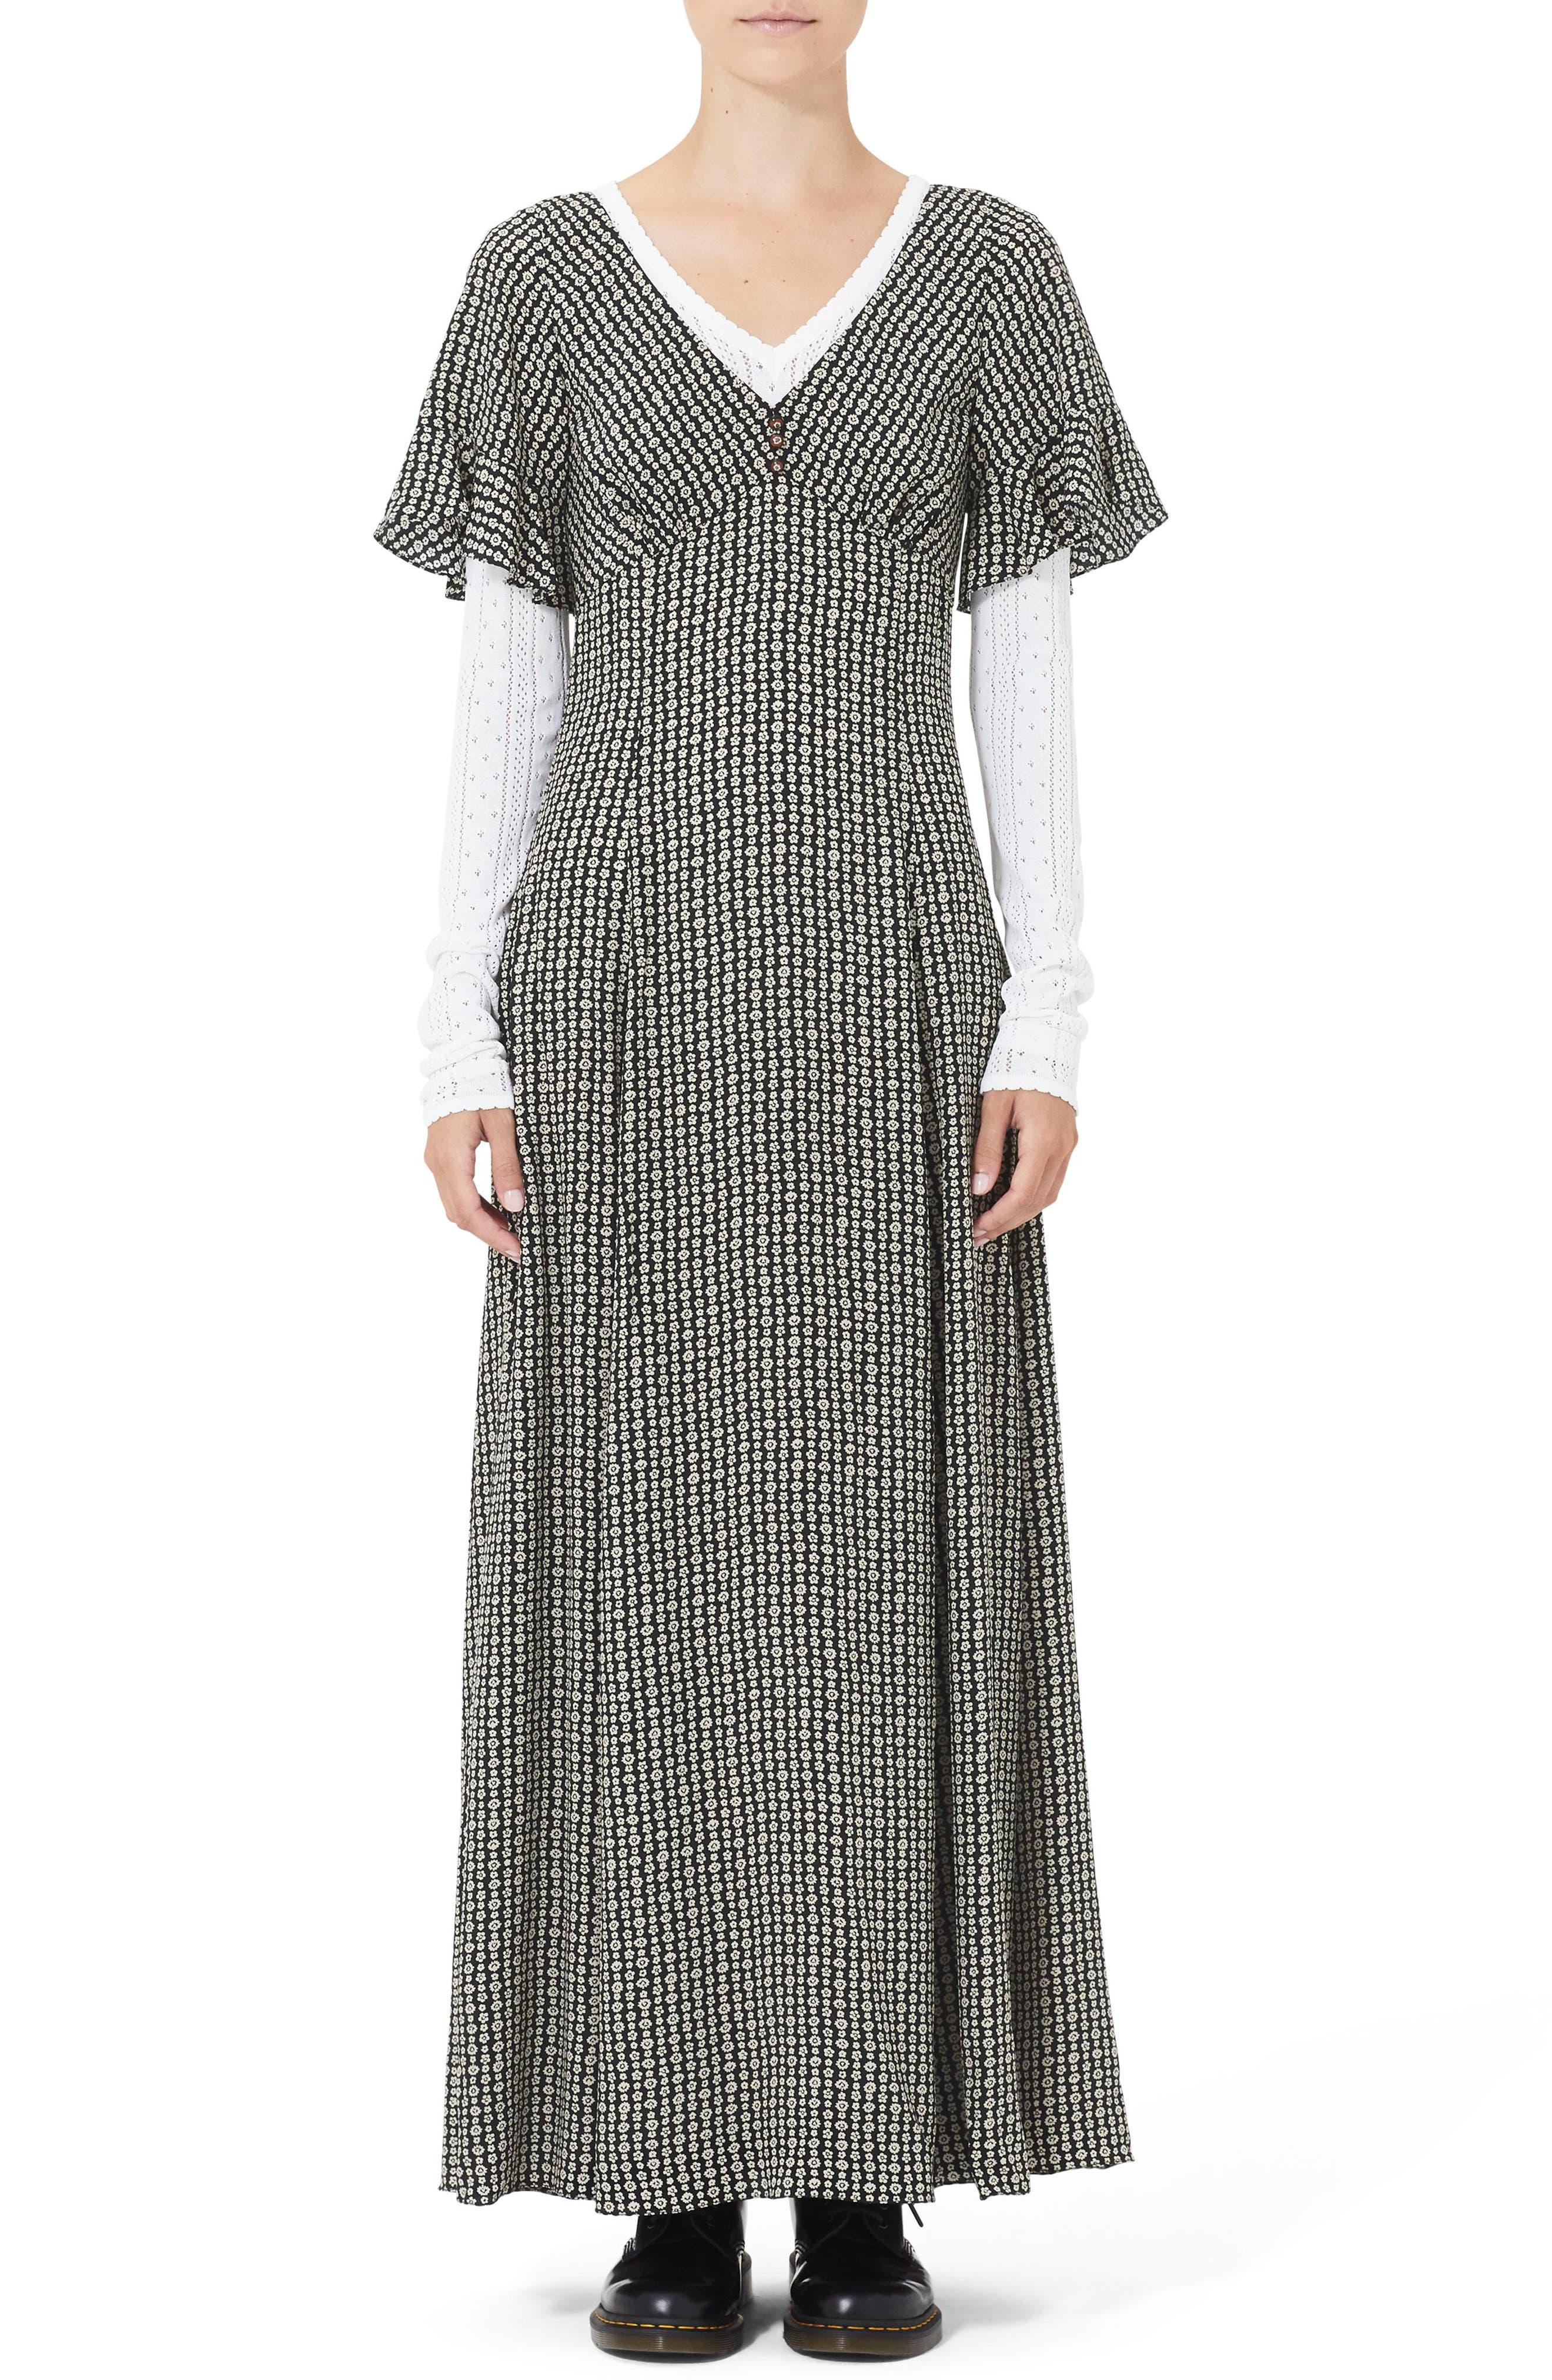 Ruffle Sleeve Floral Print Silk Maxi Dress in Black Multi